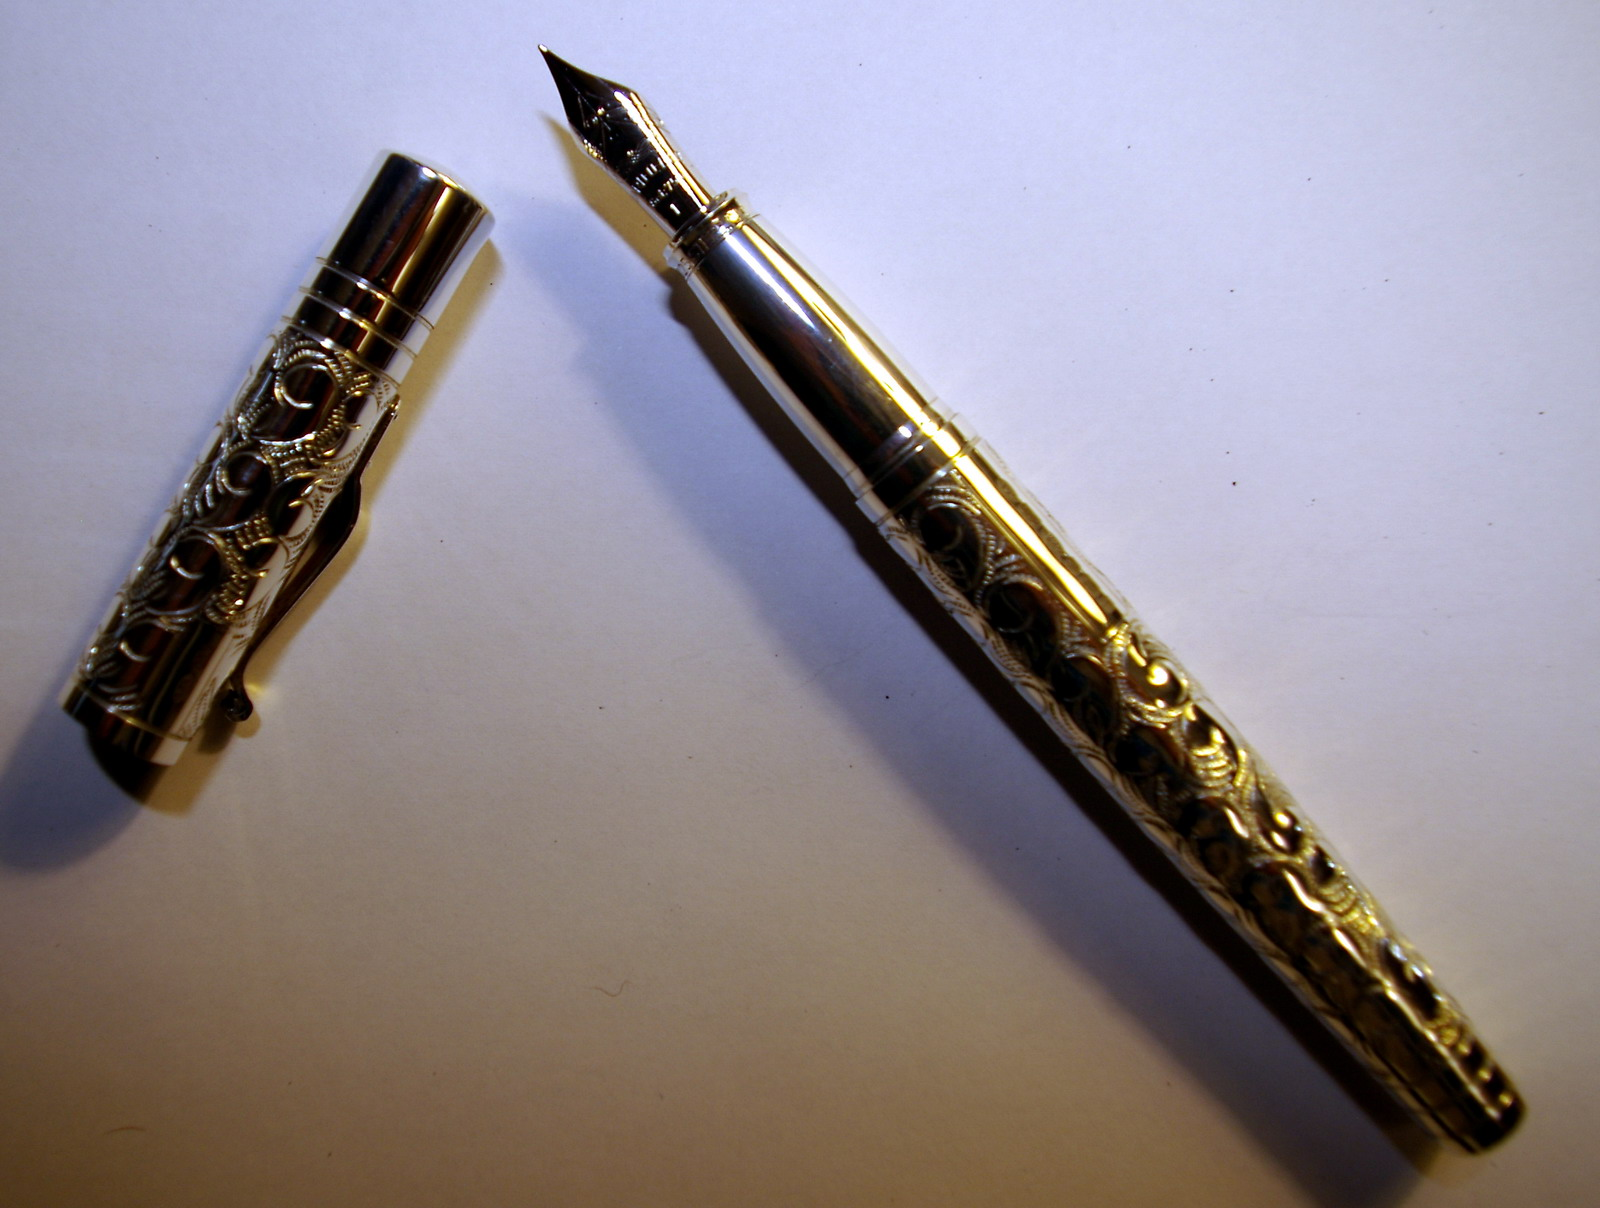 fpn_1496007949__silver_pens_3.jpg